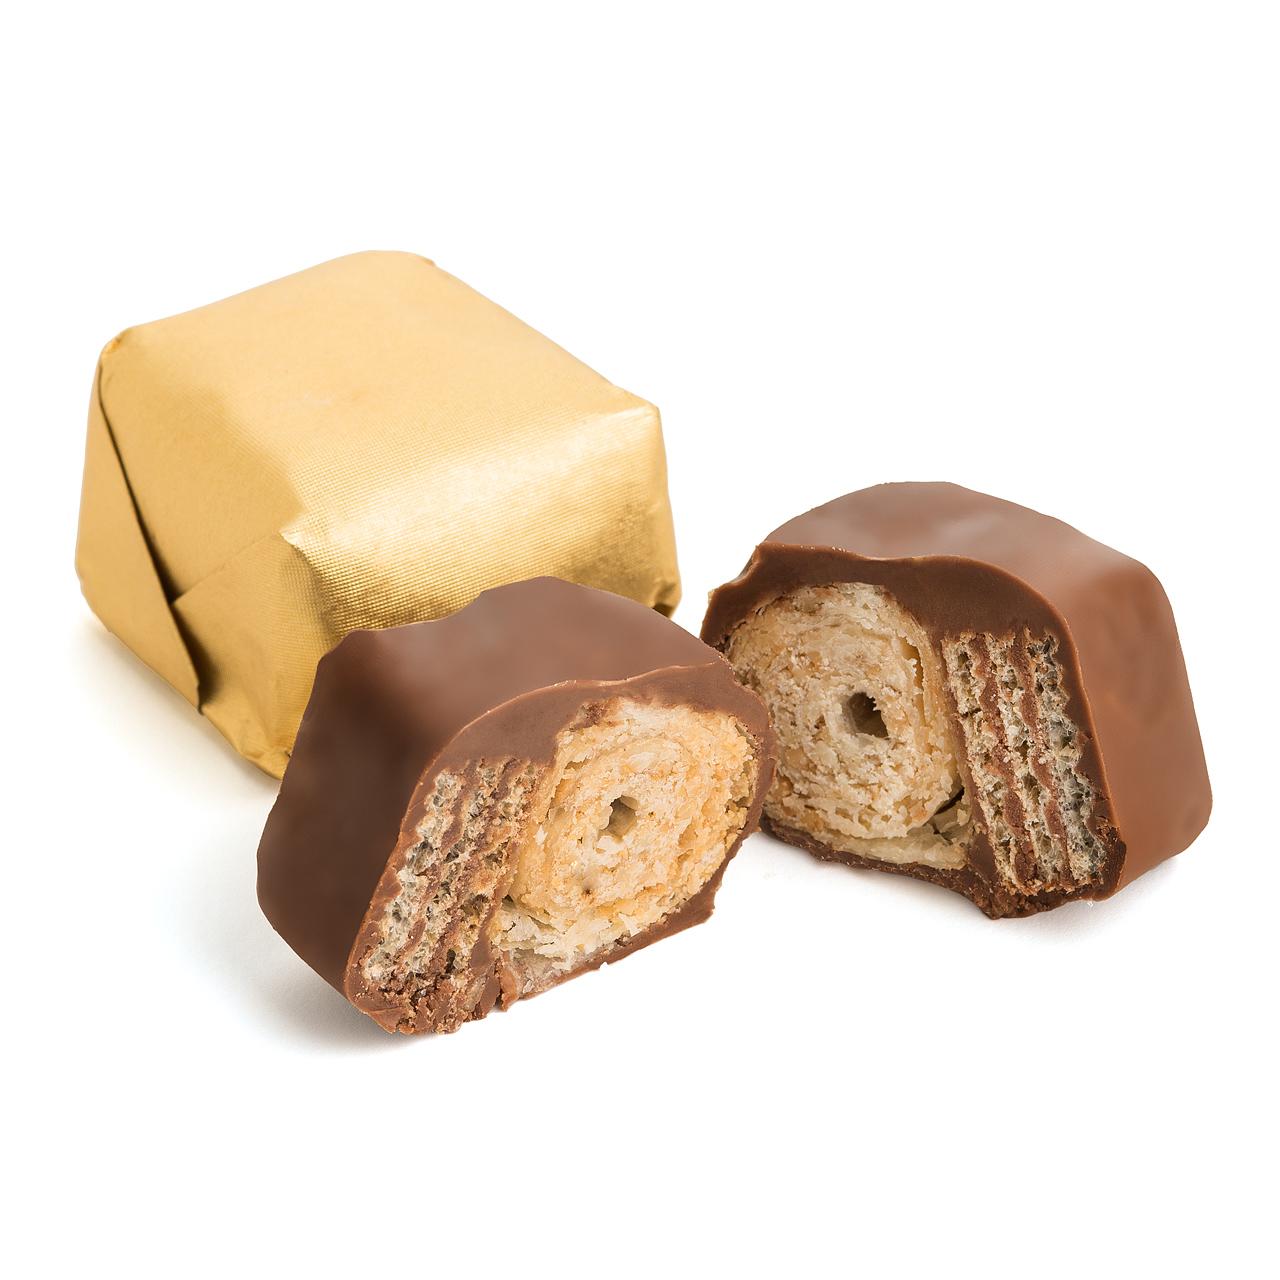 BAKLAVA-CHOCOLATE WAFERS